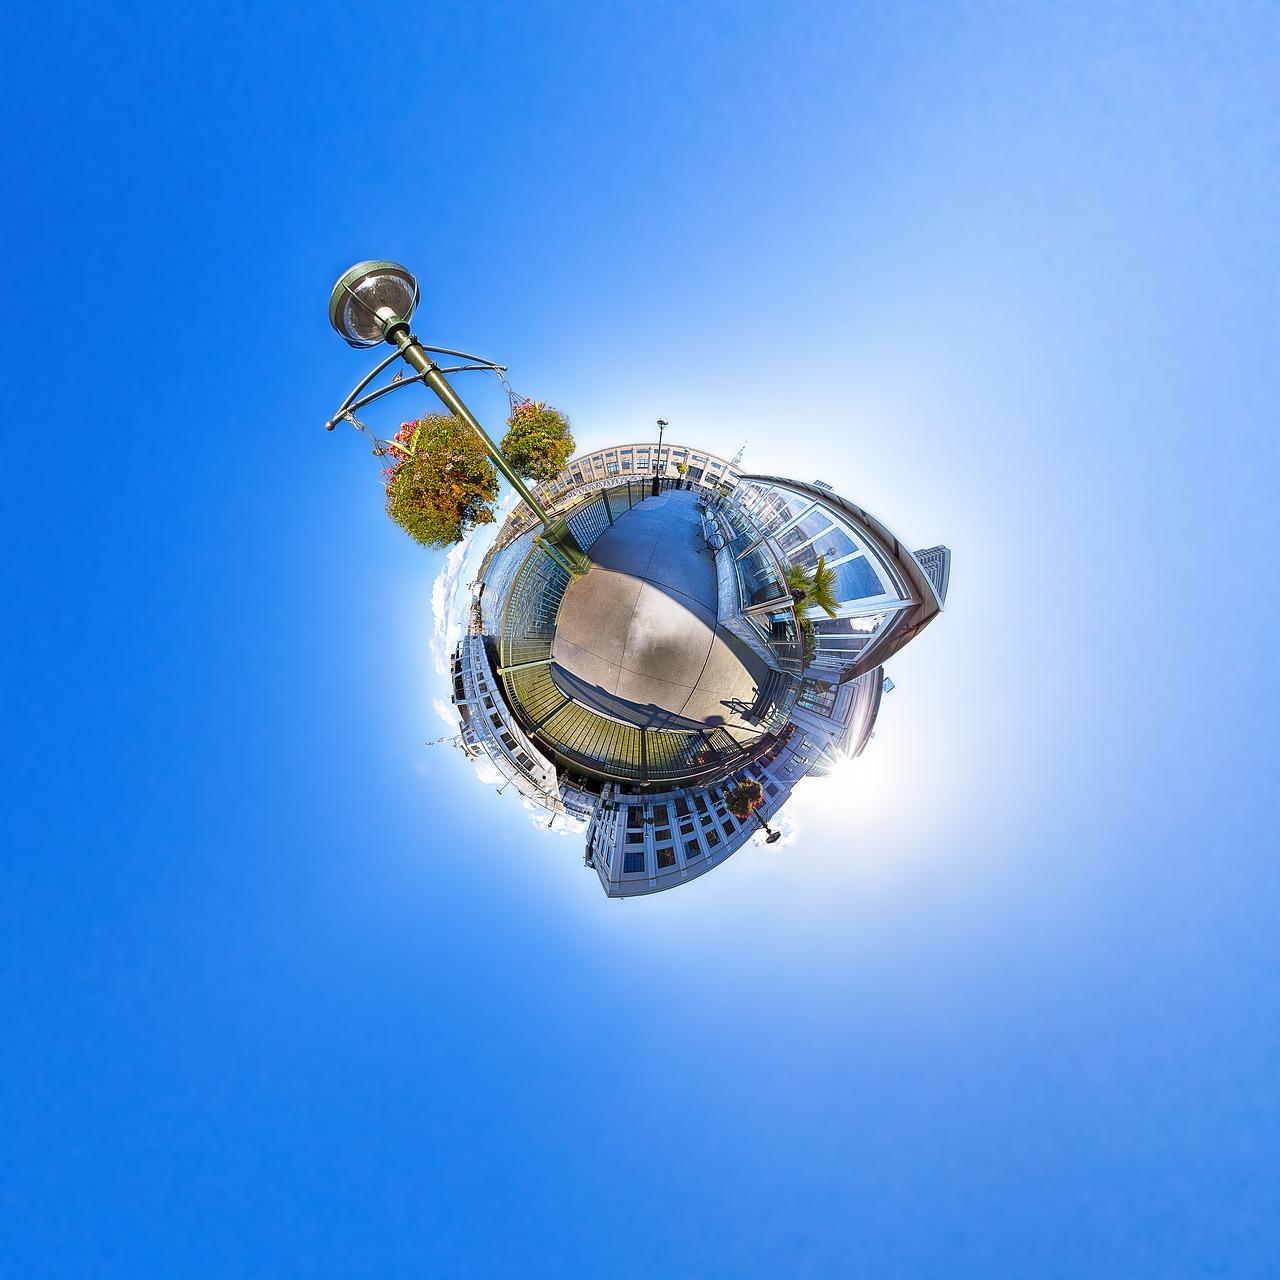 san francisco little planet 360 2135888 - 360